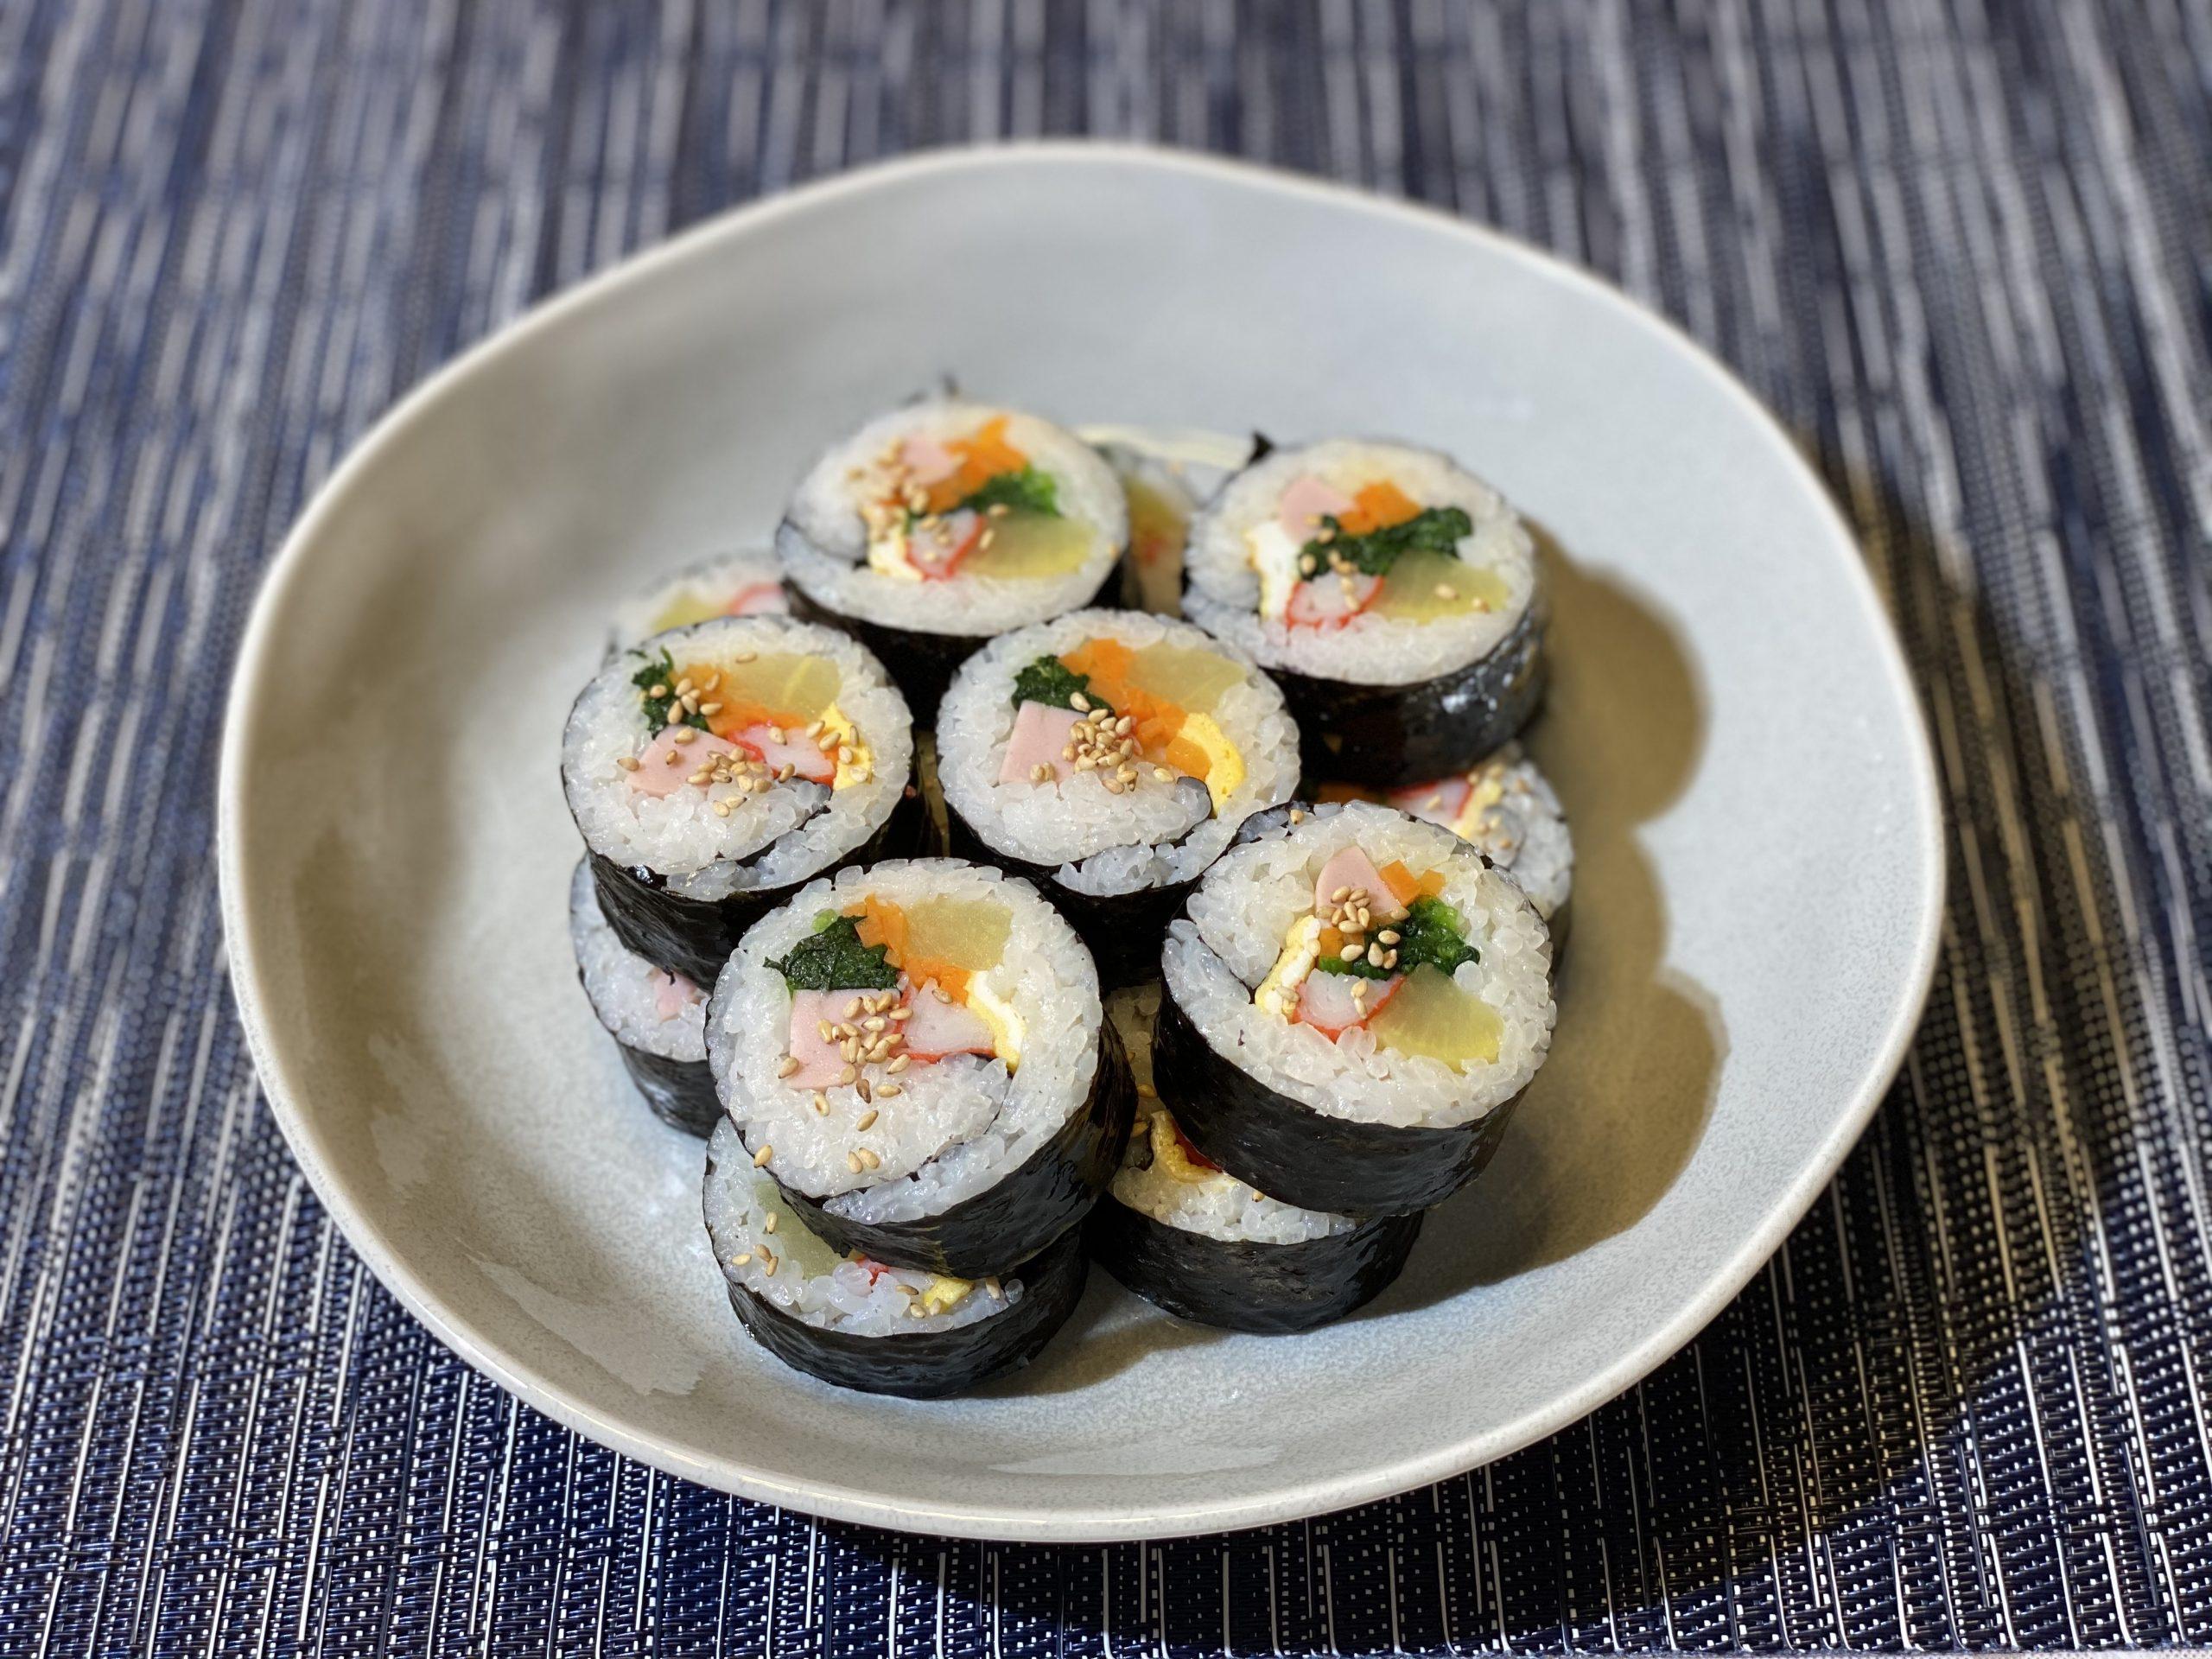 Olive家の簡単レシピ | 韓国料理 ピクニック・運動会といえばキムバップ(韓国風海苔巻き)